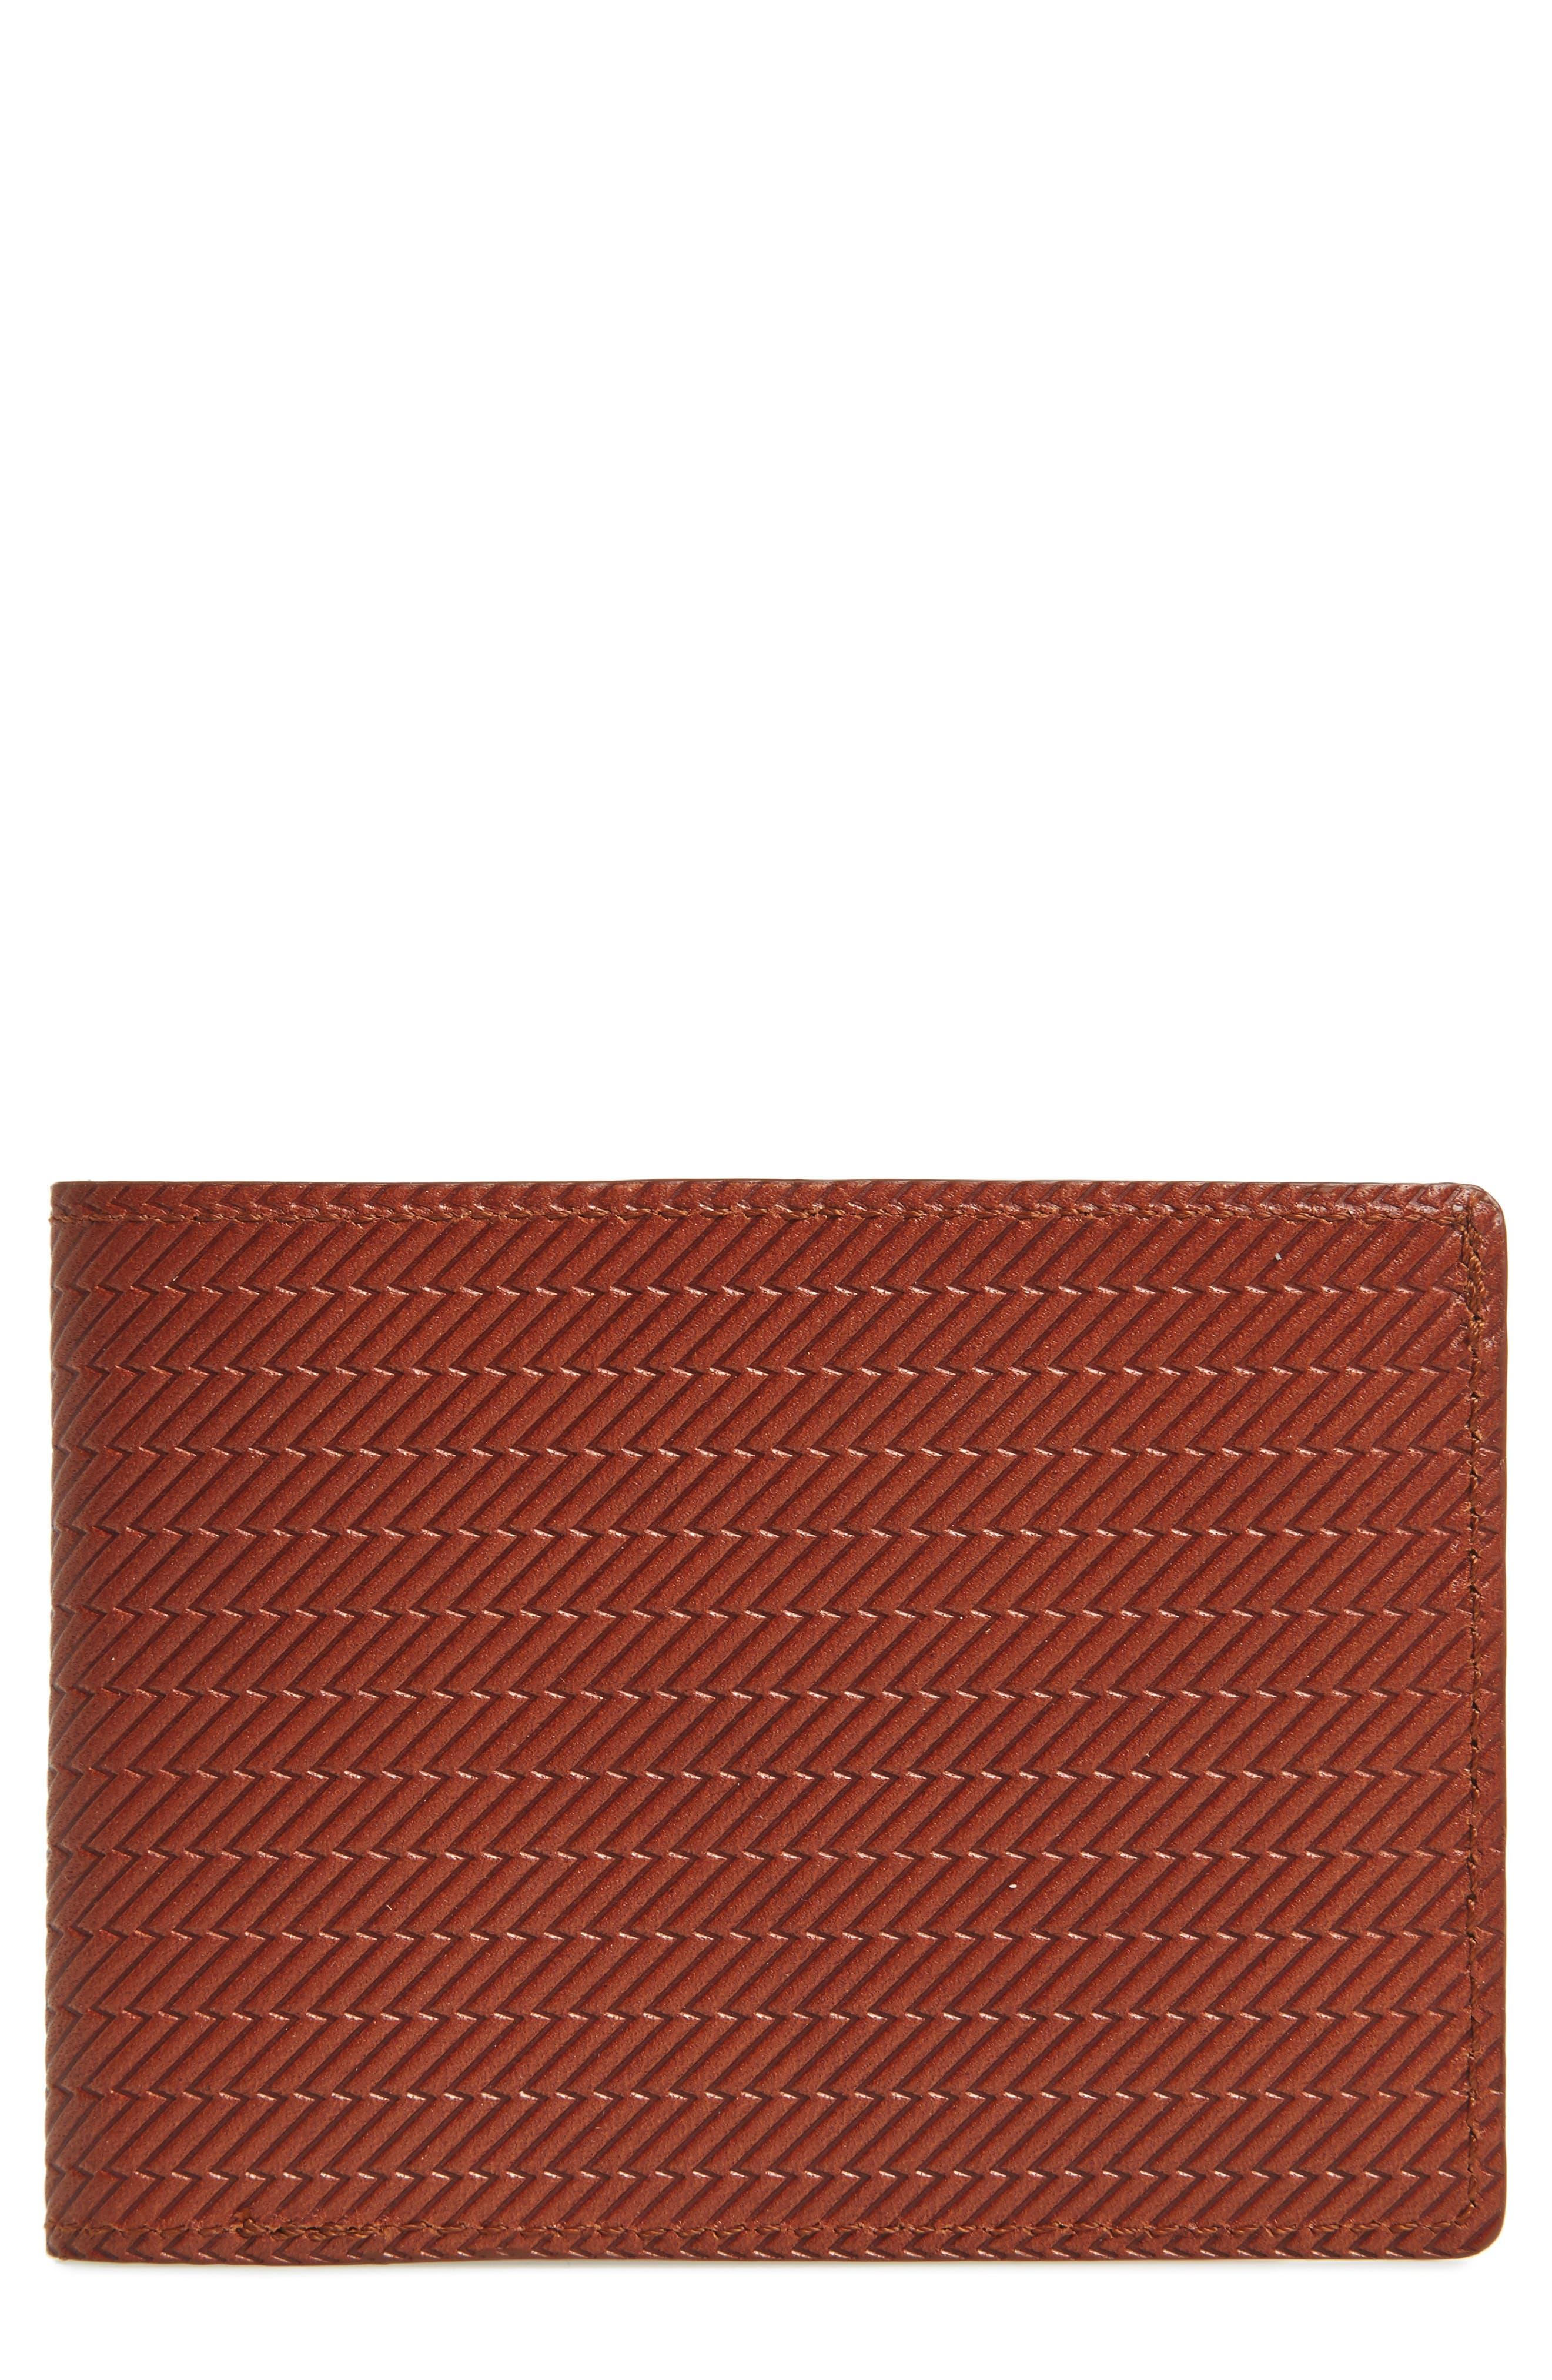 Alternate Image 1 Selected - Shinola Leather Wallet